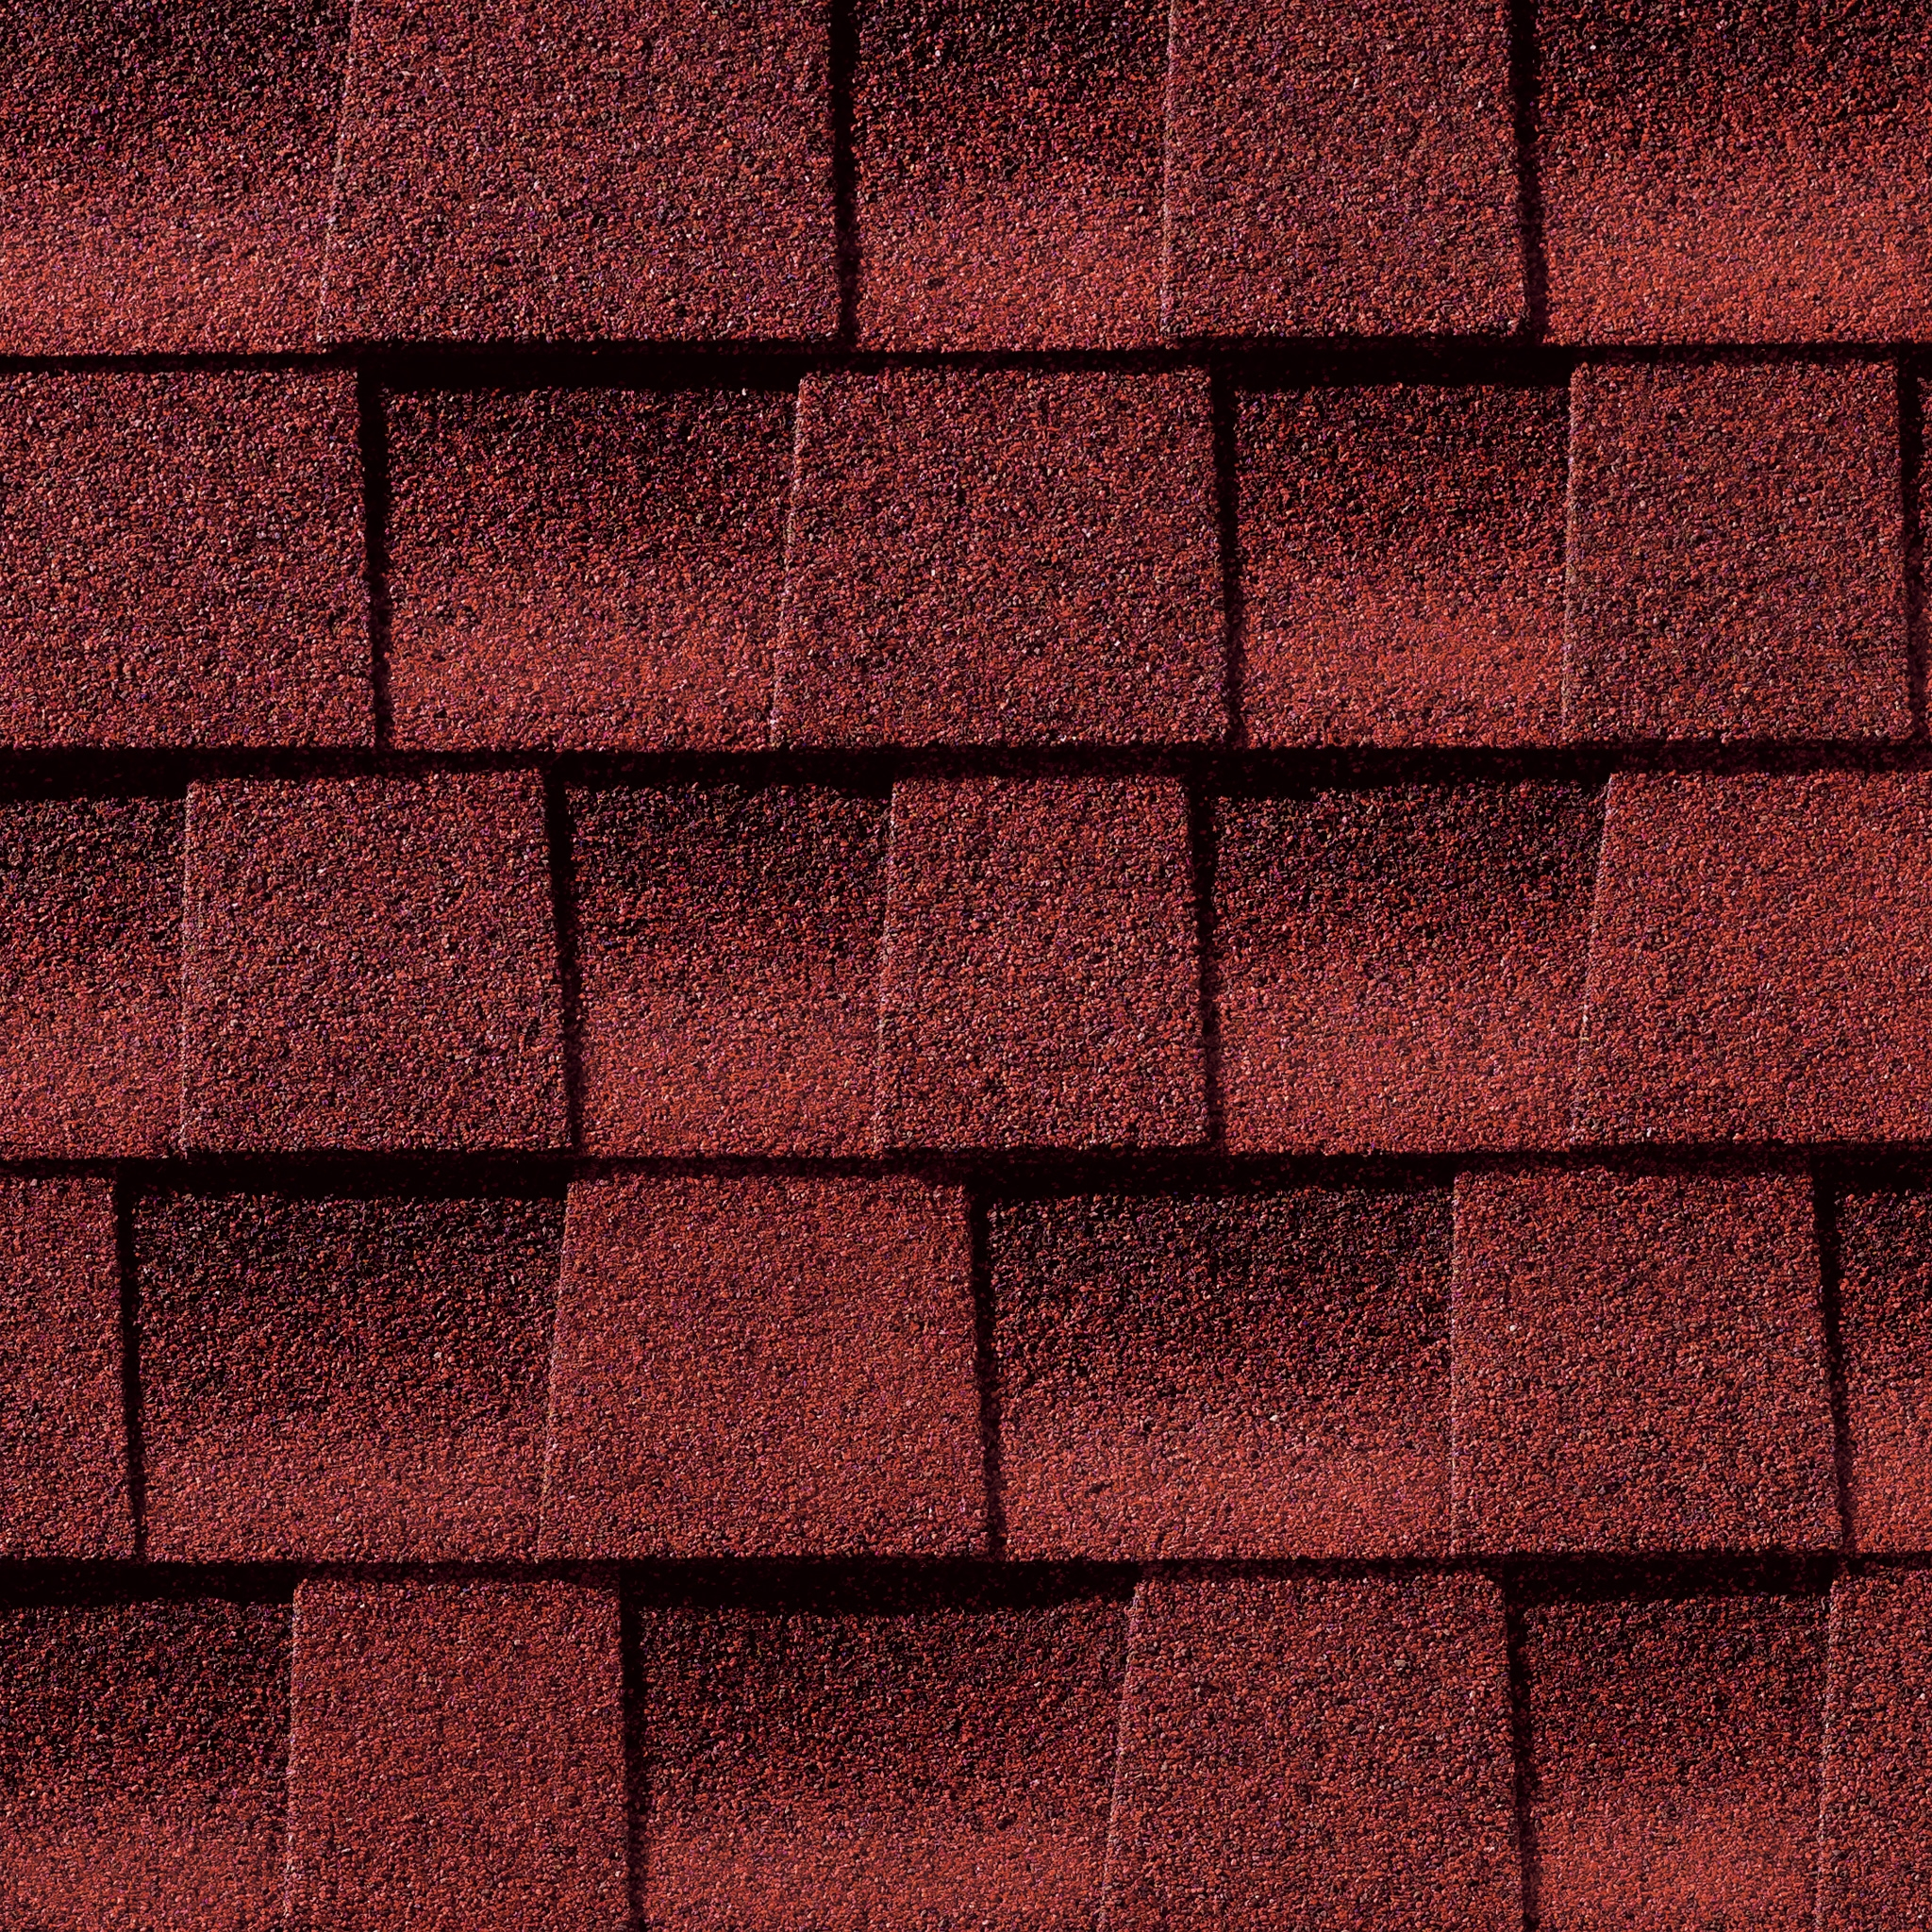 shingle roof protection